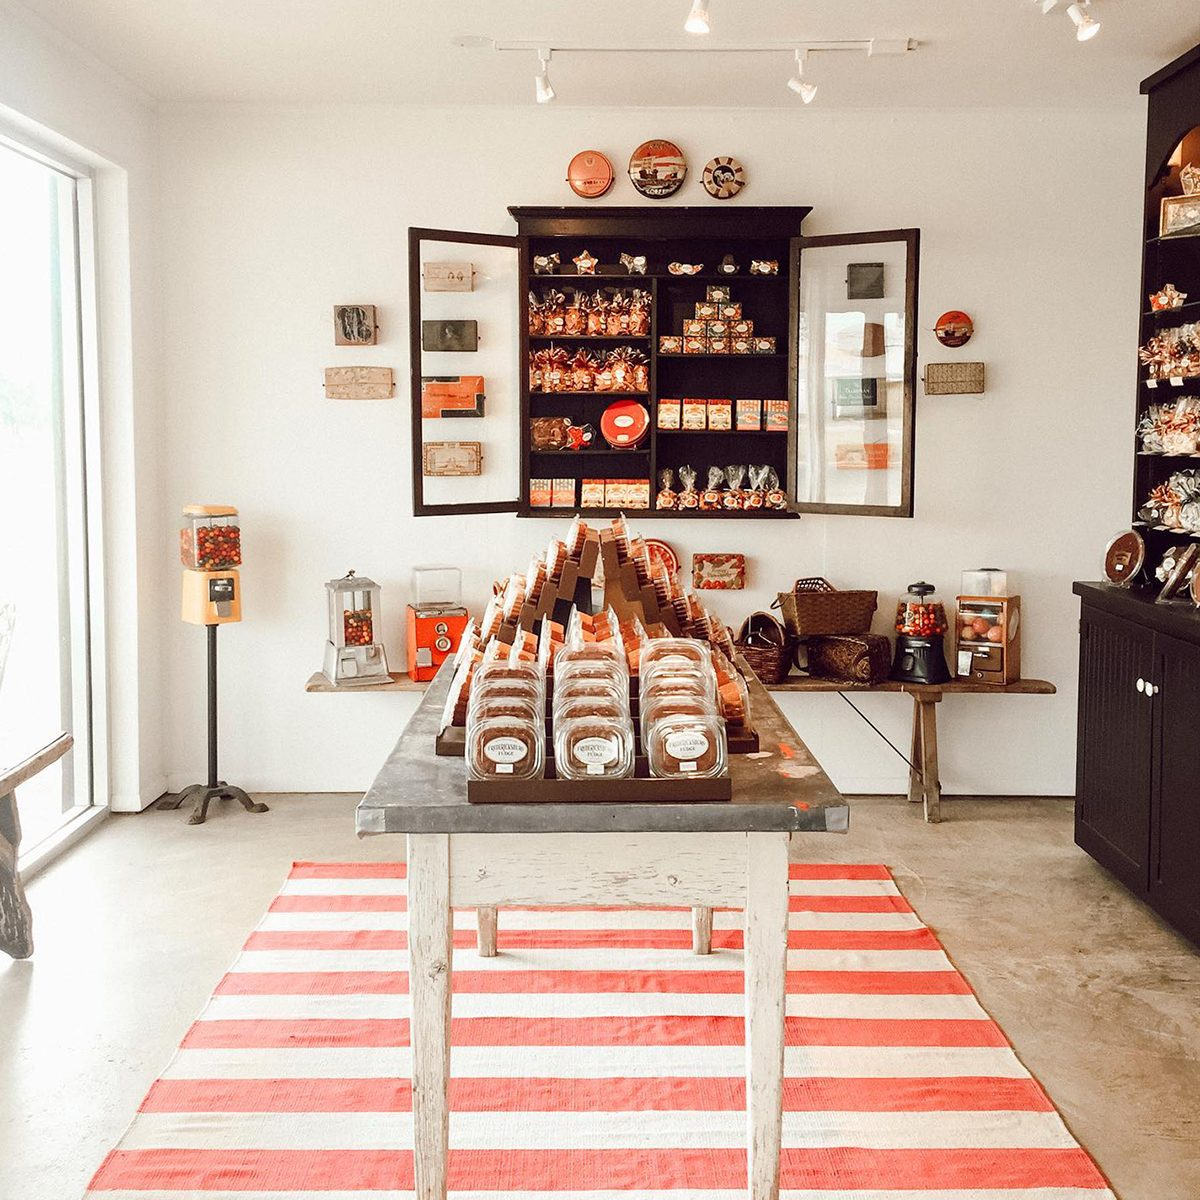 The Best Fudge Shop in Texas - Fredericksburg Fudge